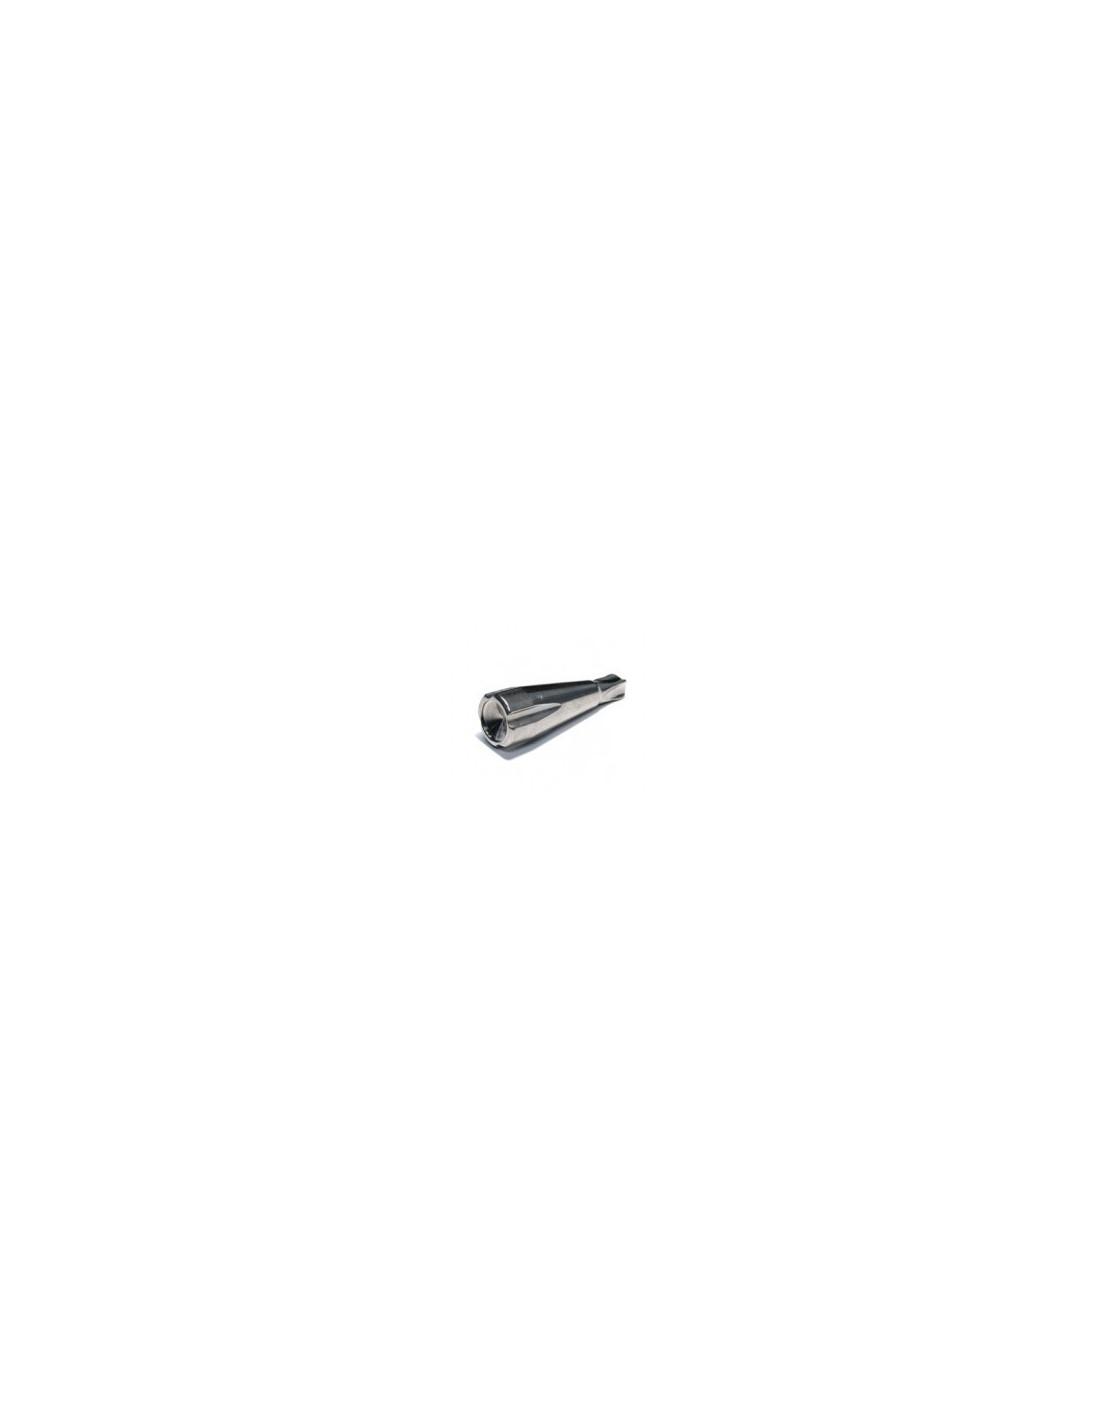 KOH01472 - Kompensatorkropp (17)